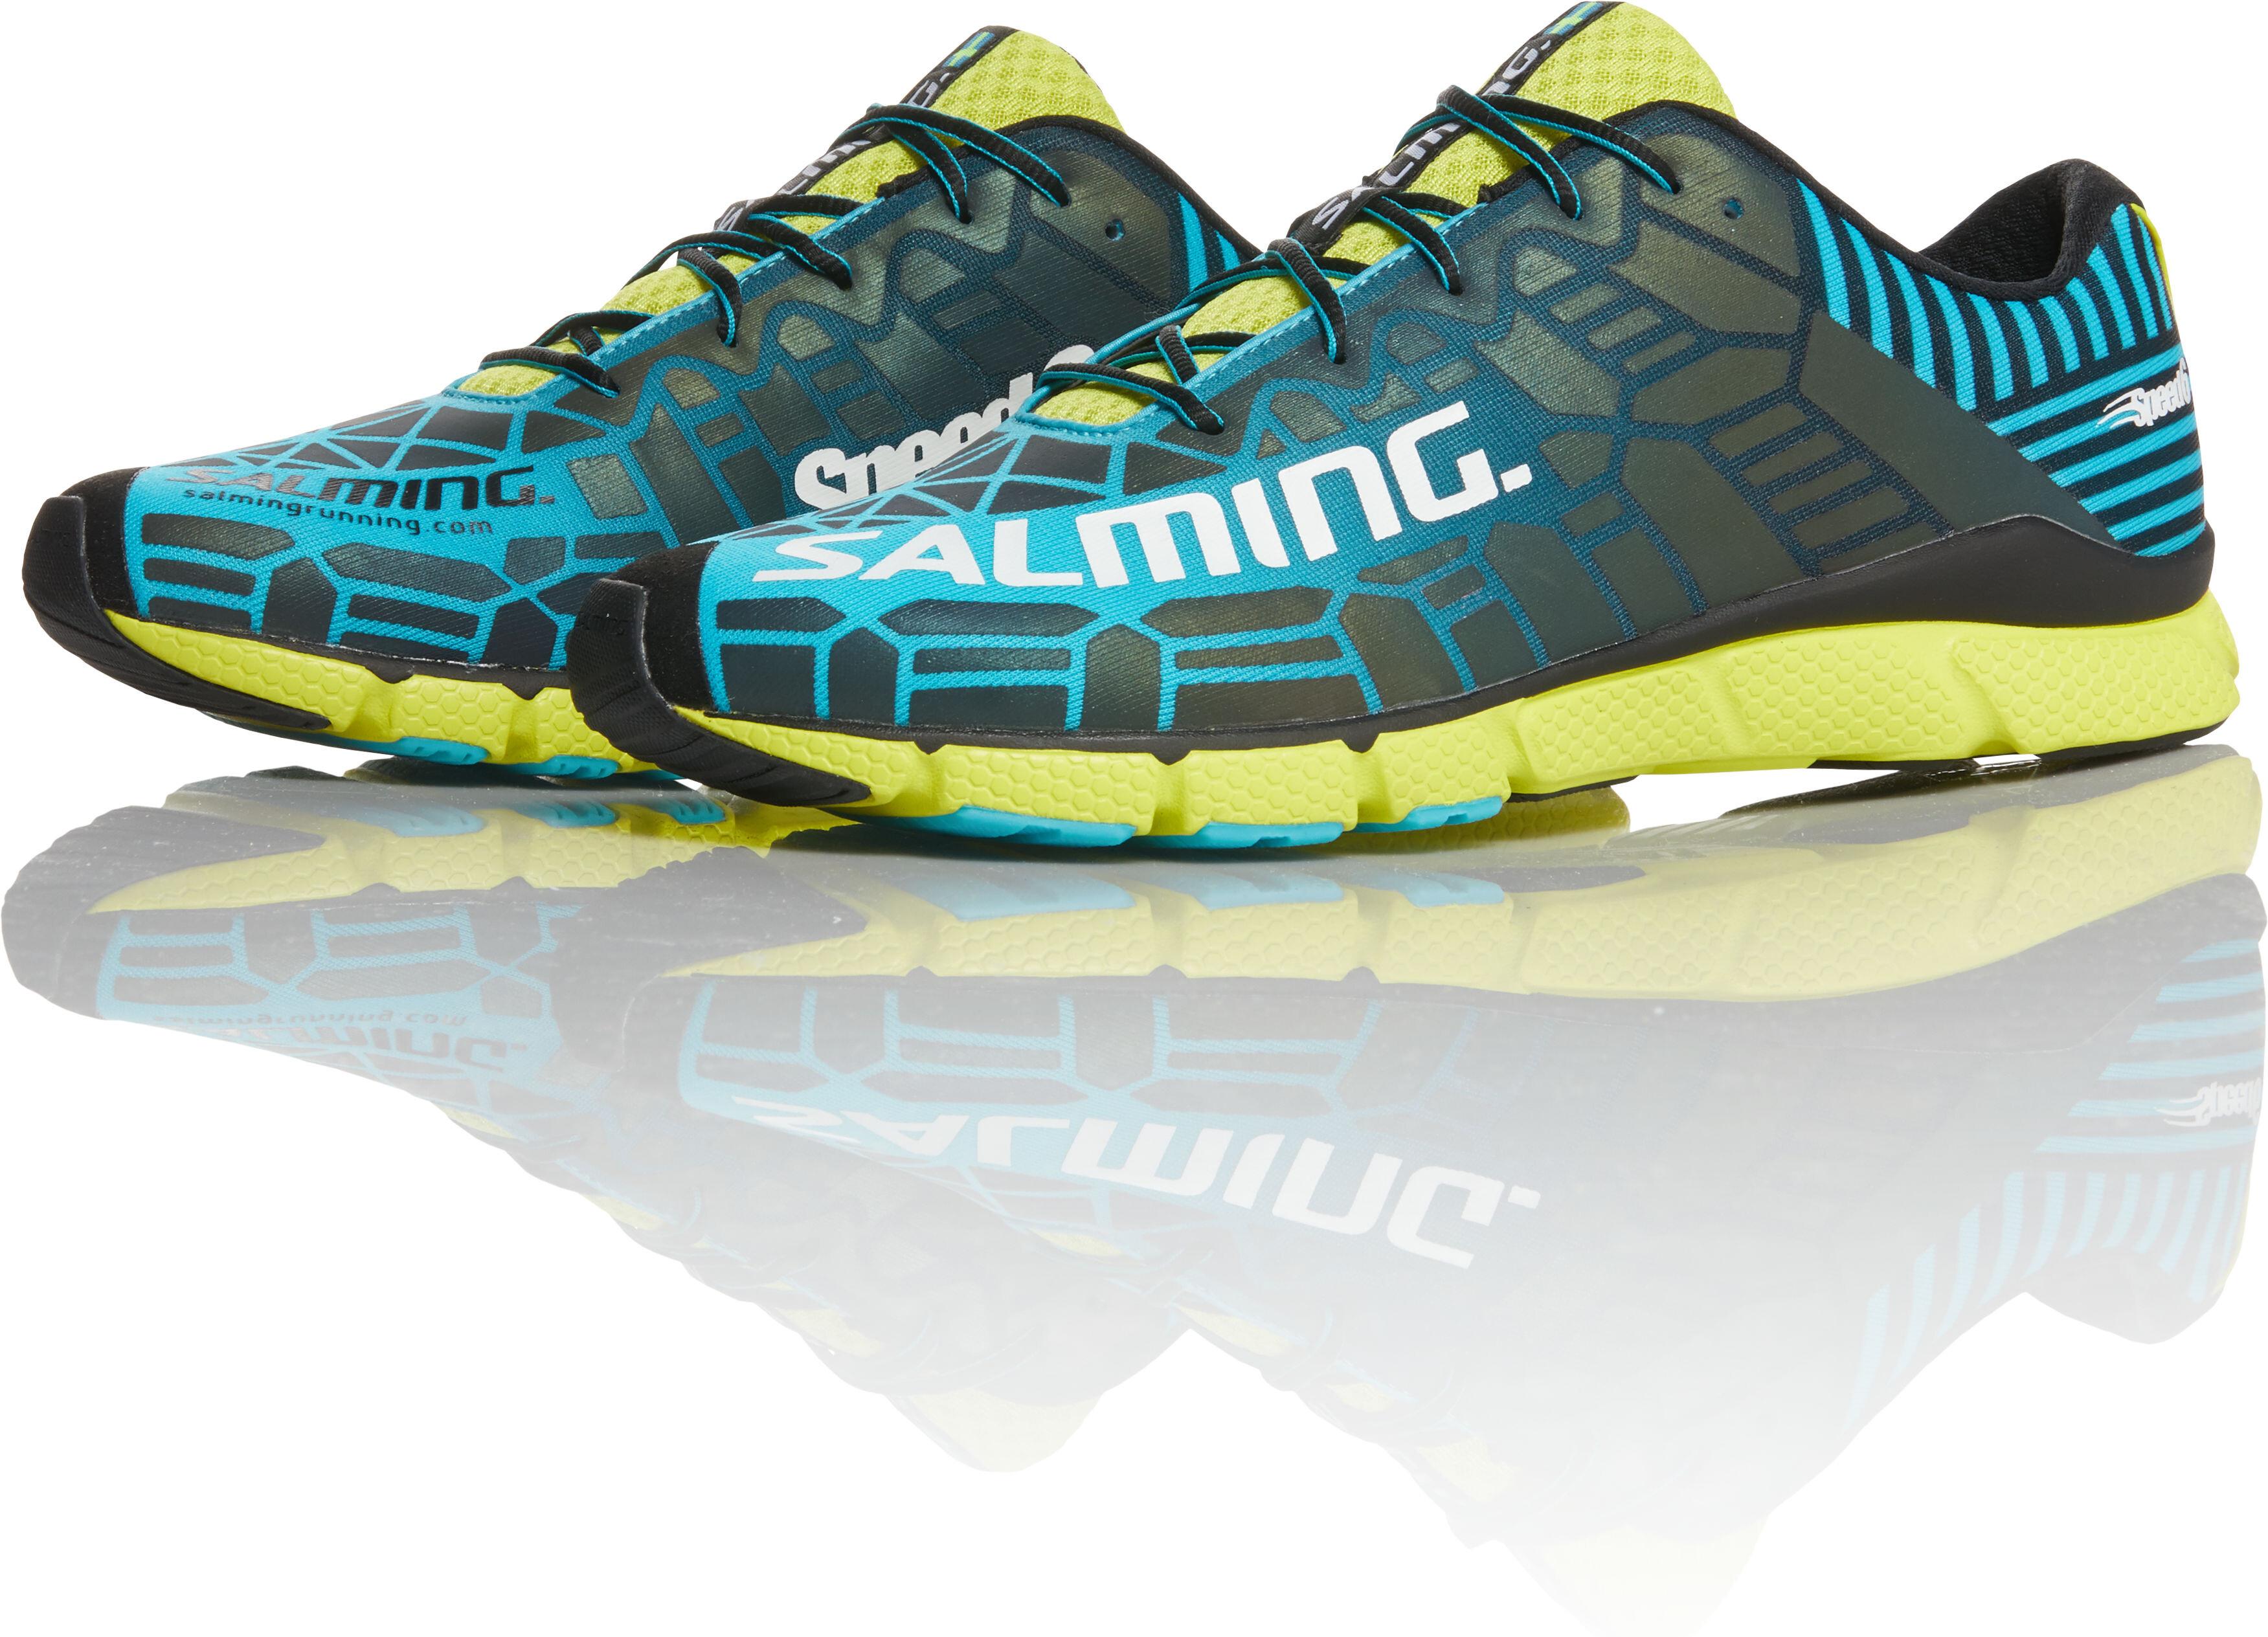 Salming Speed 6 scarpe da corsa Uomo blu nero su Bikester 0f537ffe3c7